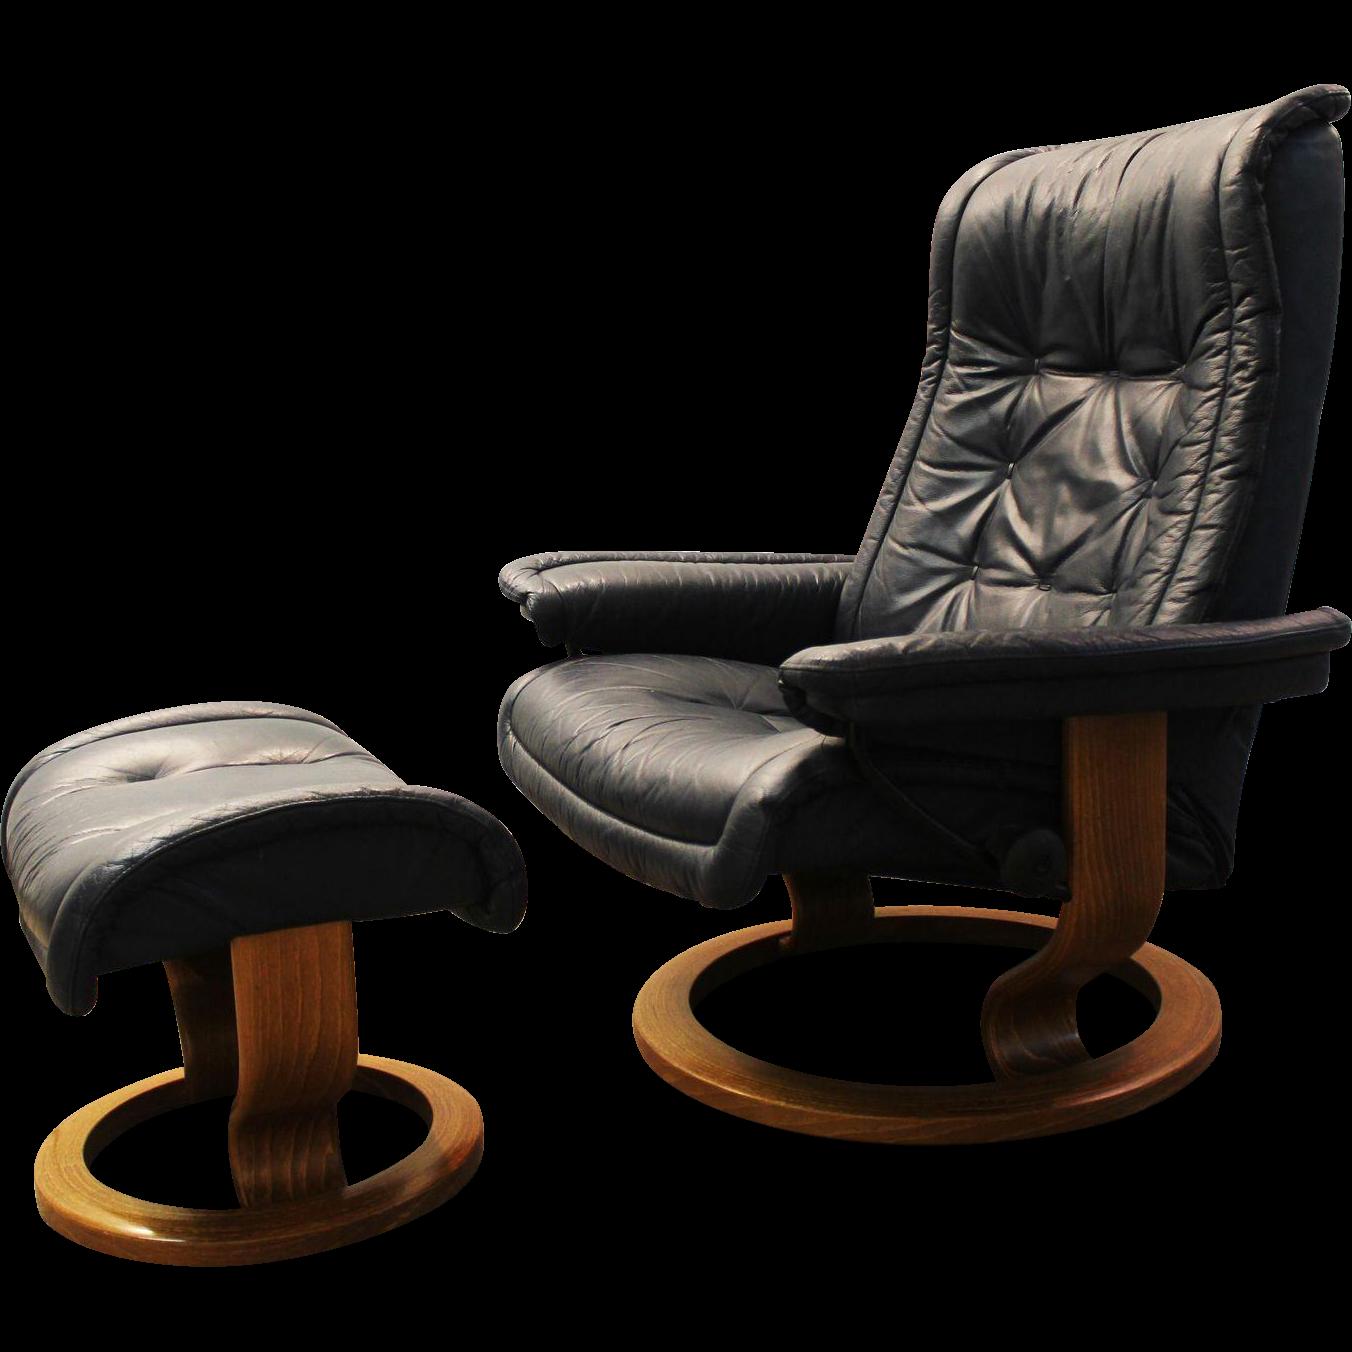 Mid Century Modern Ekornes Stressless Leather Recliner Chair/Ottoman  sc 1 st  Ruby Lane & Mid Century Modern Ekornes Stressless Leather Recliner Chair ... islam-shia.org